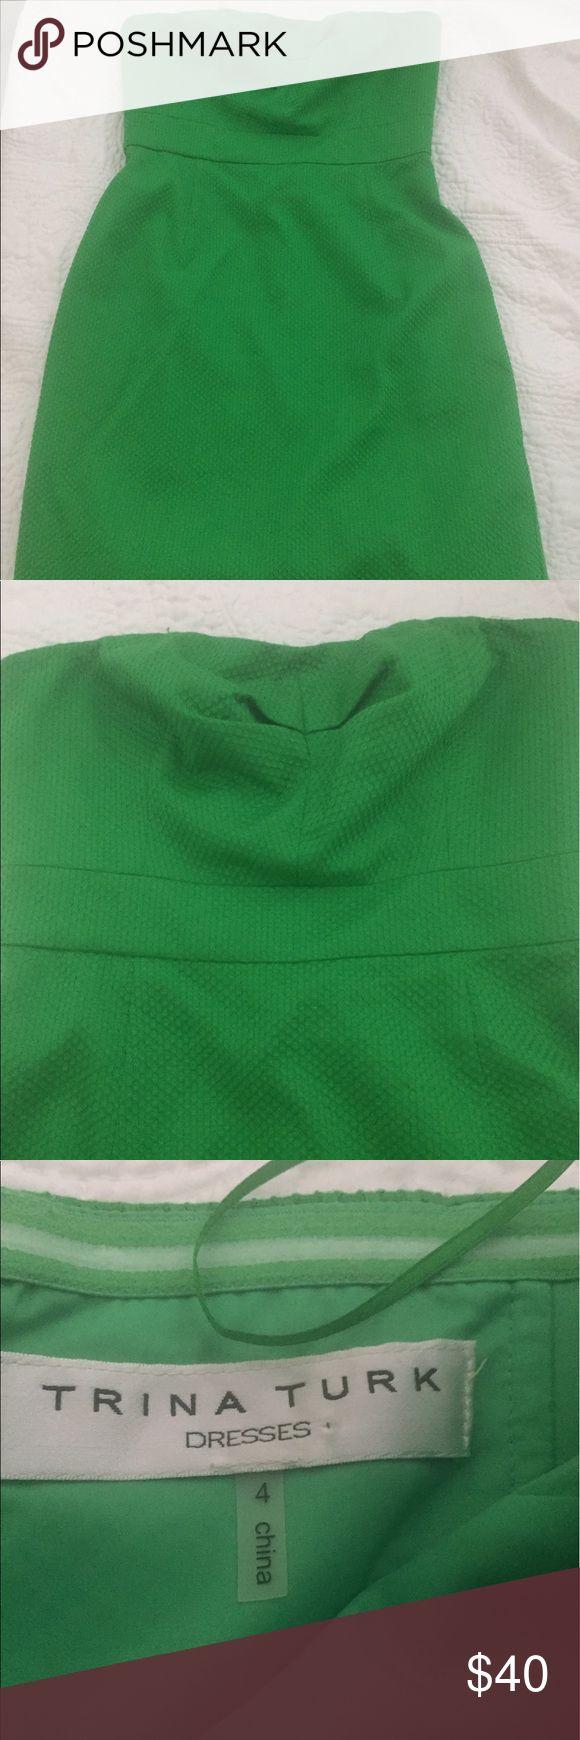 VGUC Green Trina Turk dress Purchased from another Posh user. Beautiful green color Trina Turk Dresses Midi